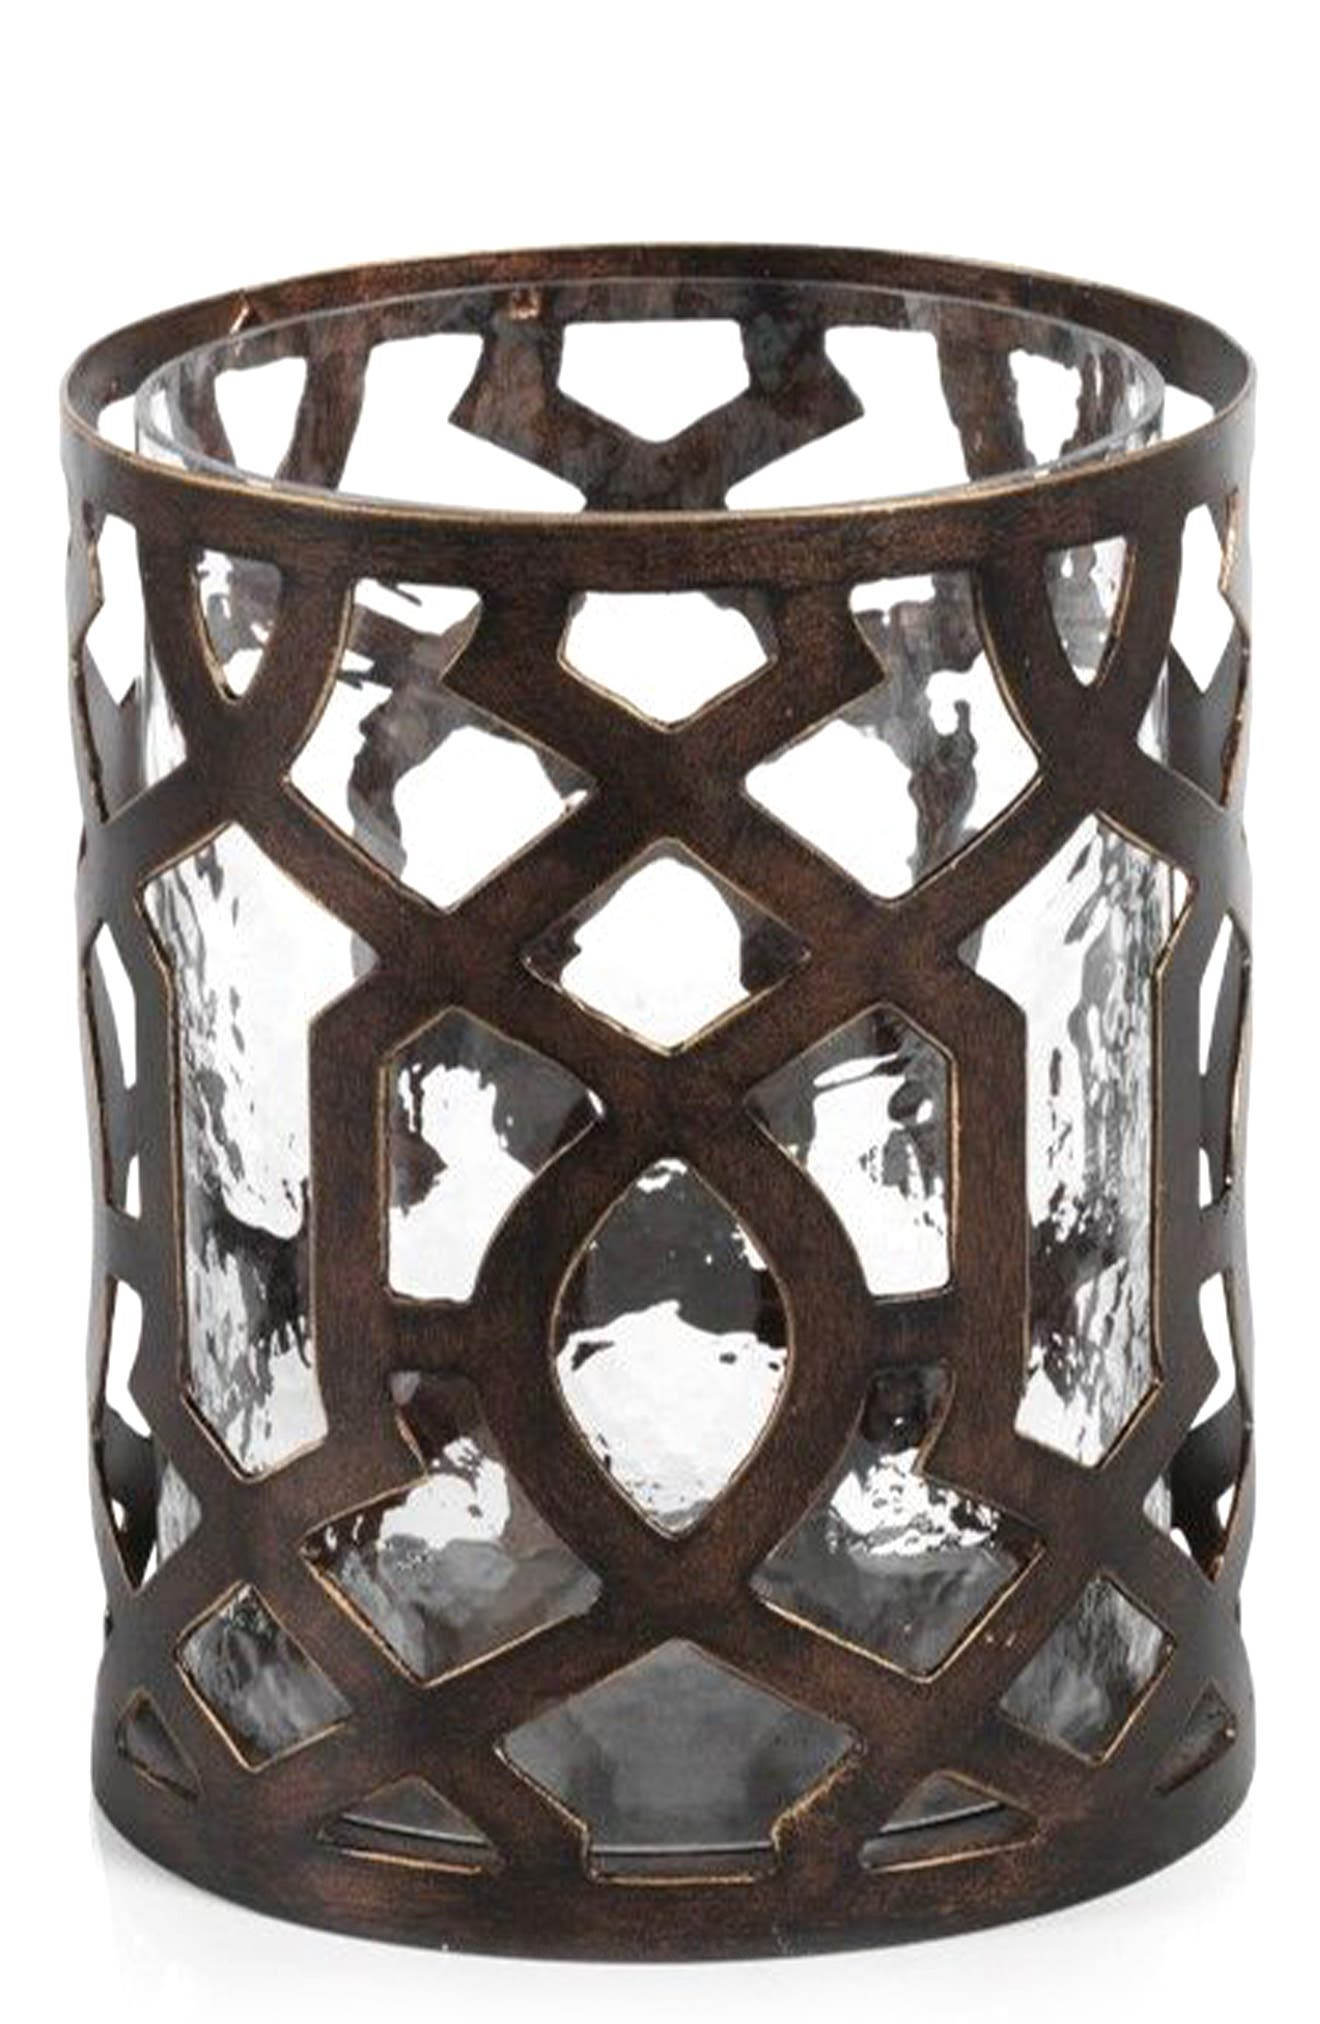 Small Trocadero Hurricane Candle Holder,                         Main,                         color, Metallic/ Silver/ Grey